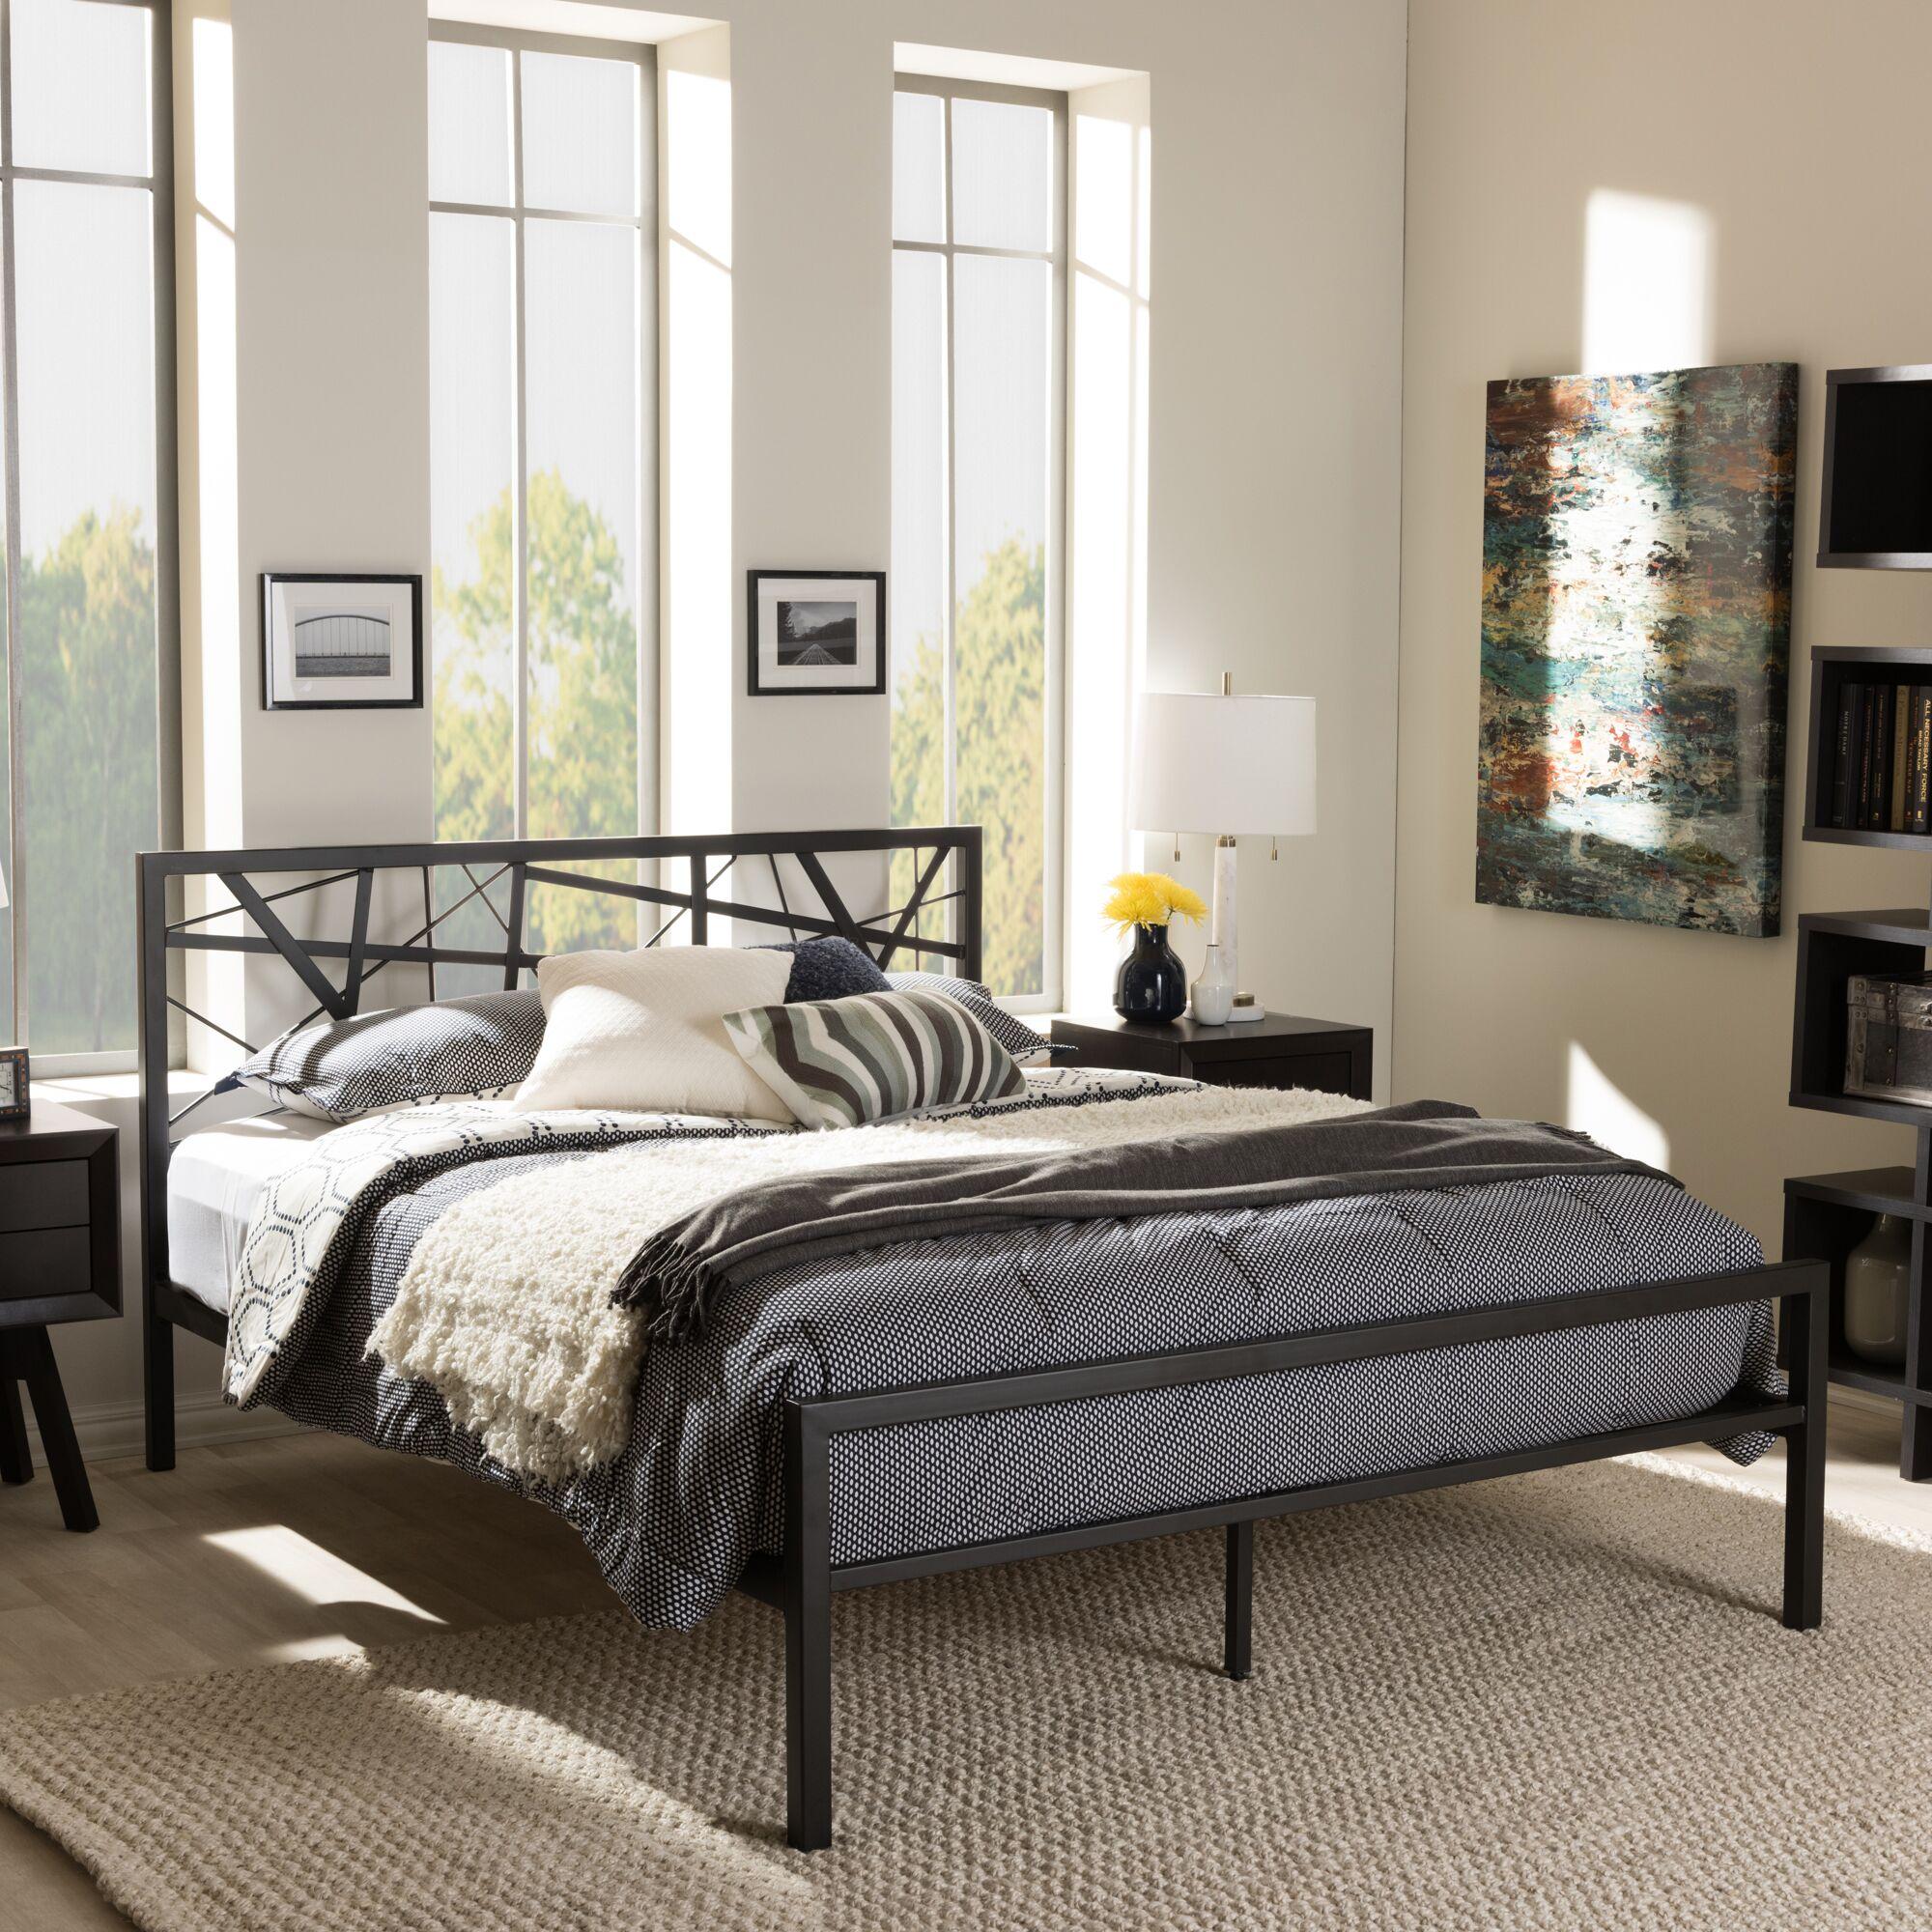 Smyth Platform Bed Size: Full